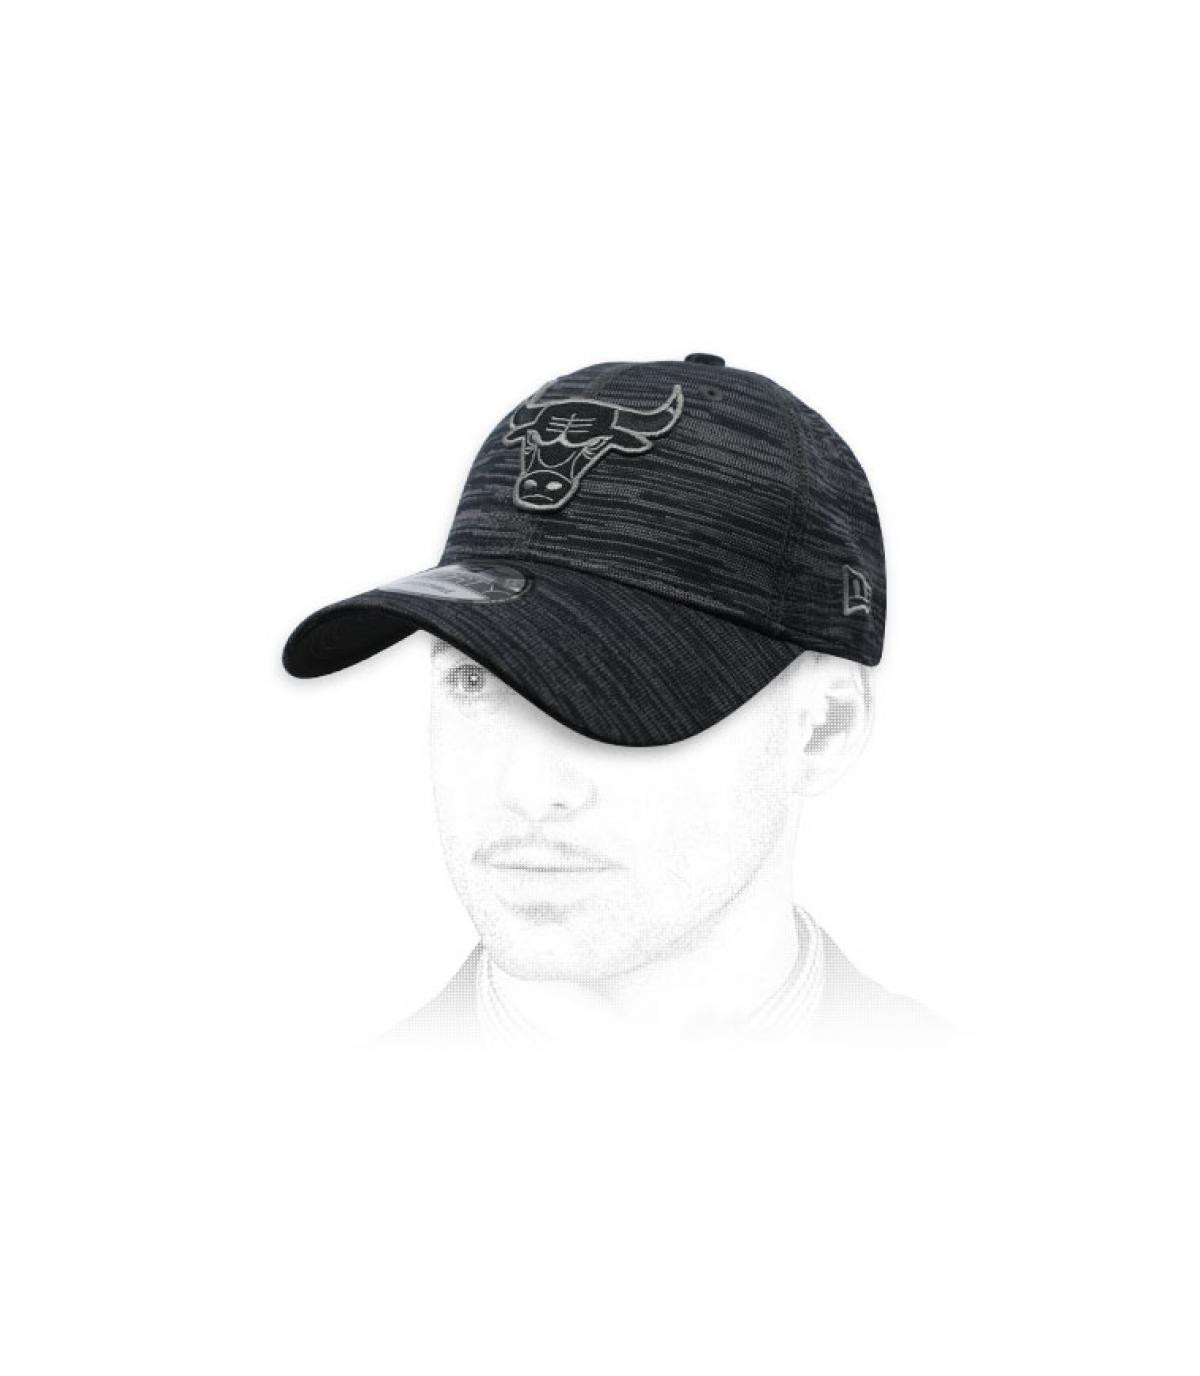 heather black Bulls cap